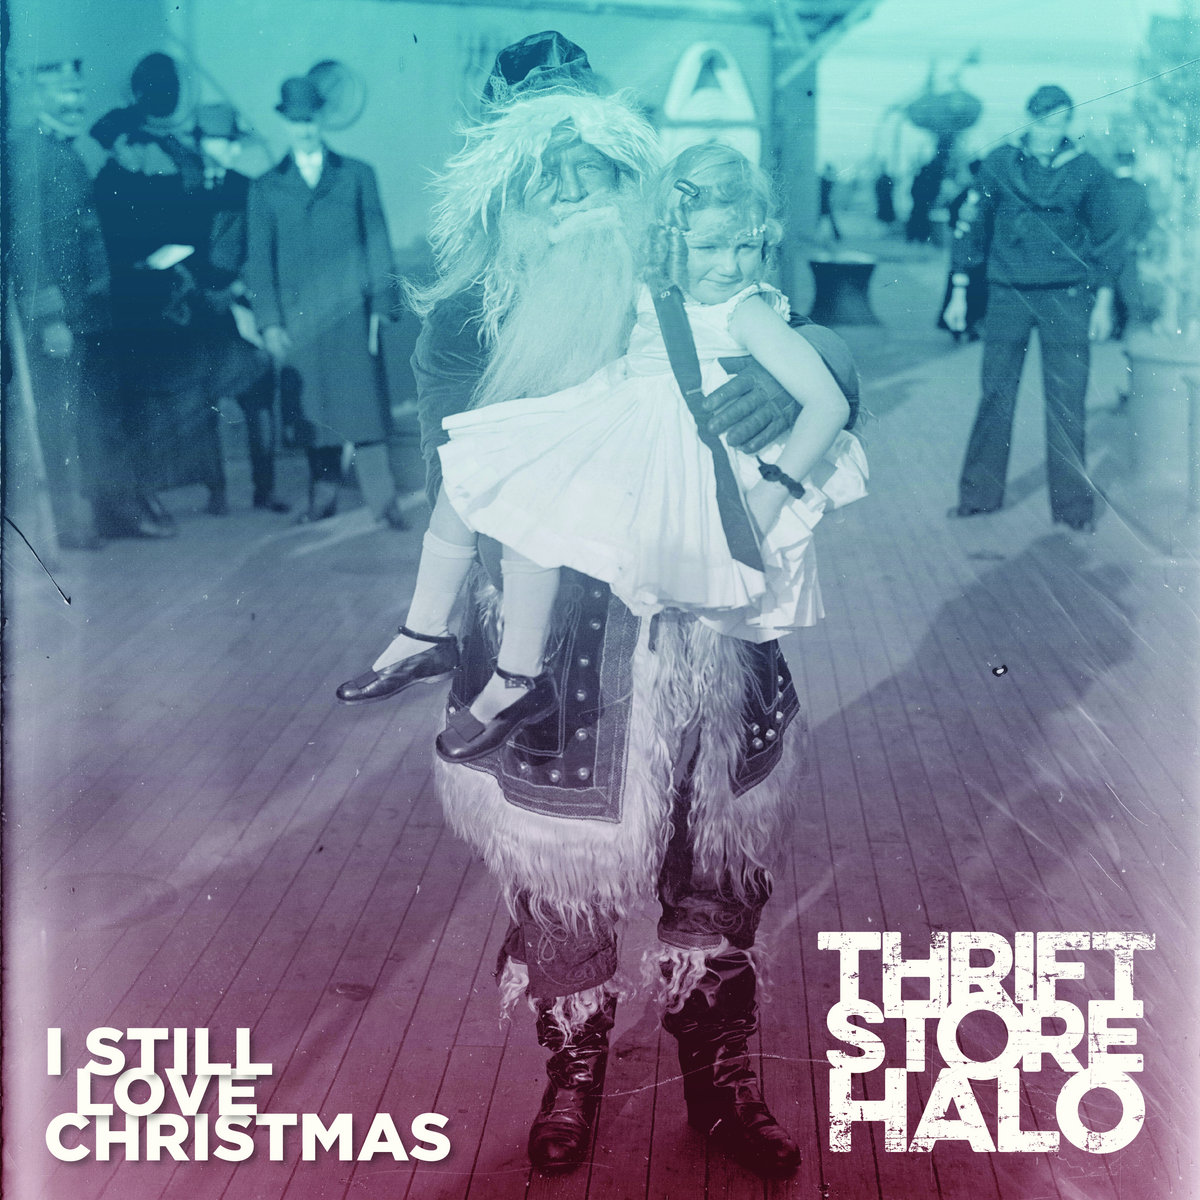 Klove Christmas Radio.I Still Love Christmas Thrift Store Halo